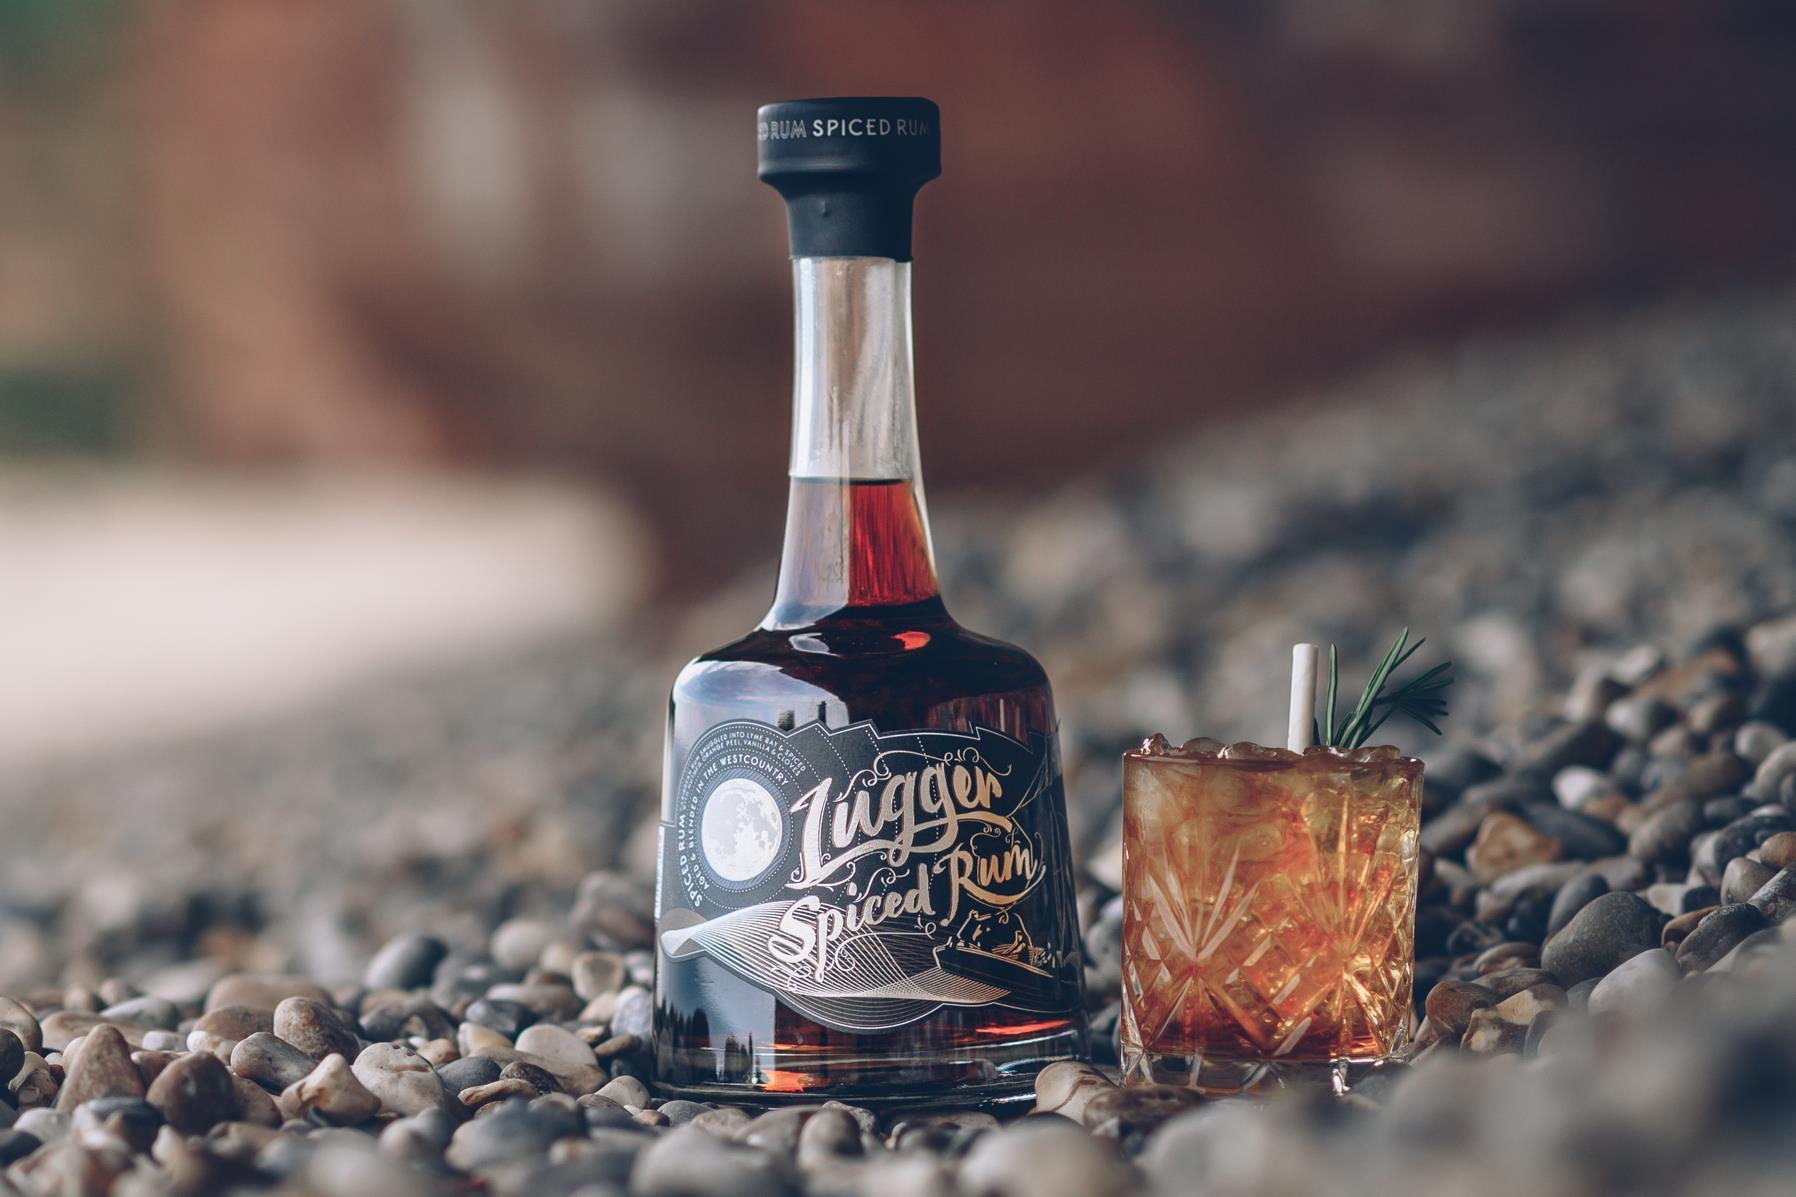 lugger rum on devon beach wins gold award